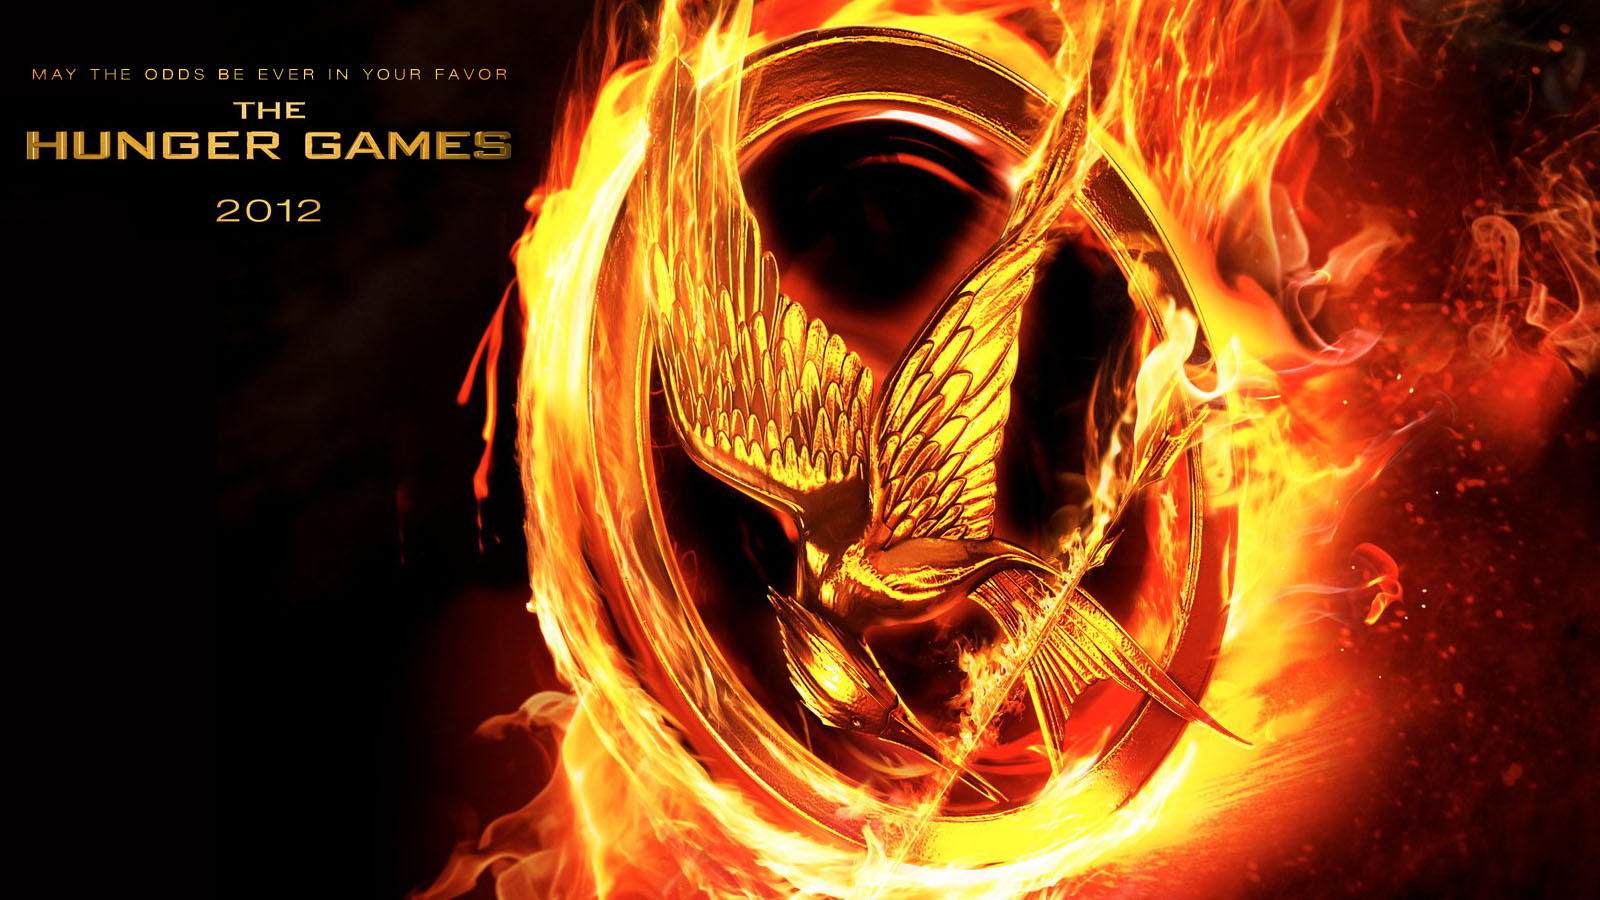 http://1.bp.blogspot.com/-JKl1xaT97iE/T2zLoND0SiI/AAAAAAAABUs/8vC6hit0Vuc/s1600/-The-Hunger-Games-Movie-Poster-Wallpapers-the-hunger-games-24129223-1600-900.jpg